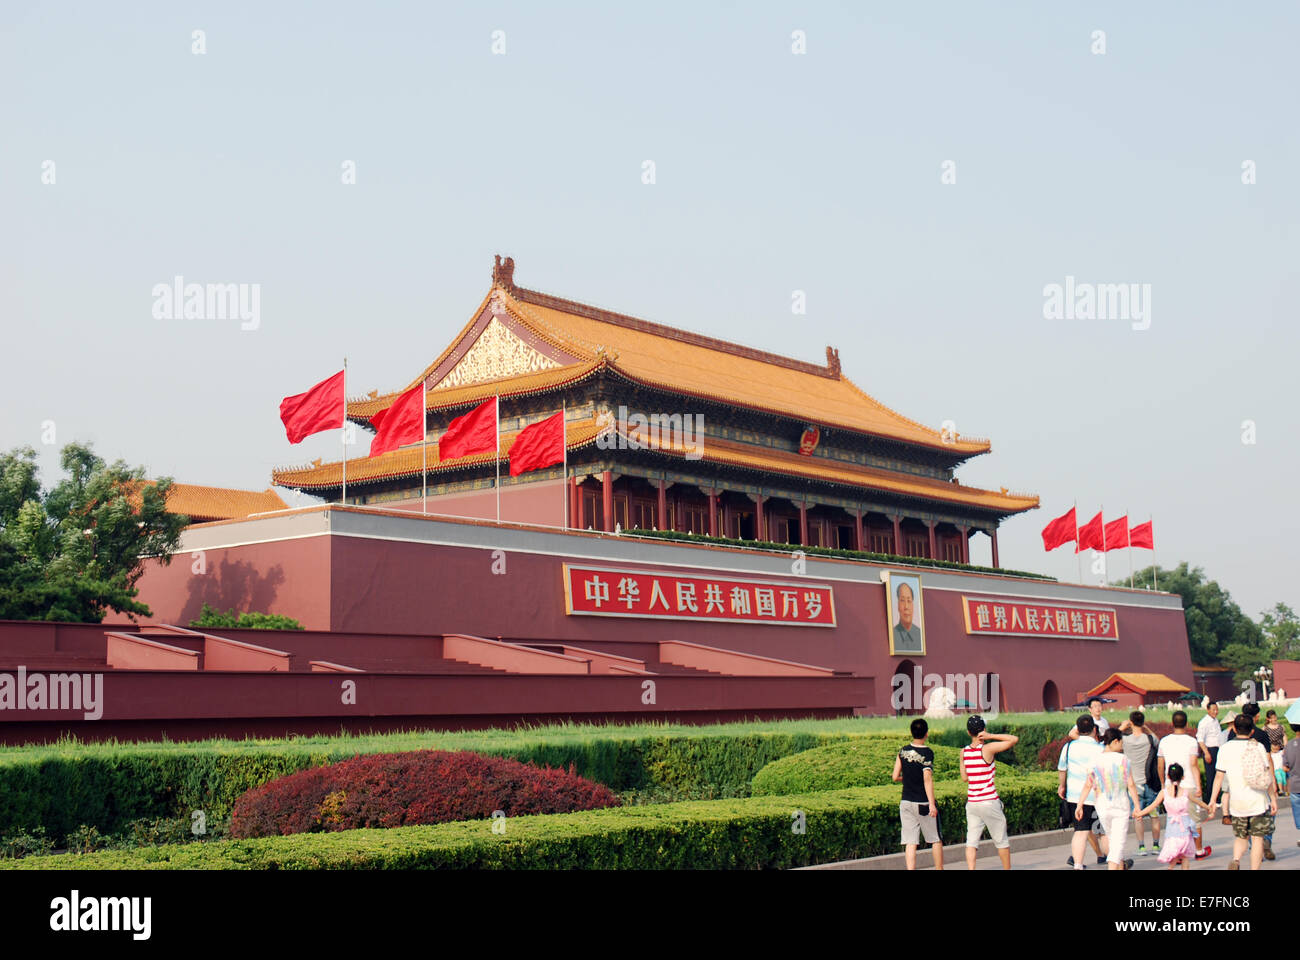 Entrée interdite Palace, Beijing, China 2014 Photo Stock